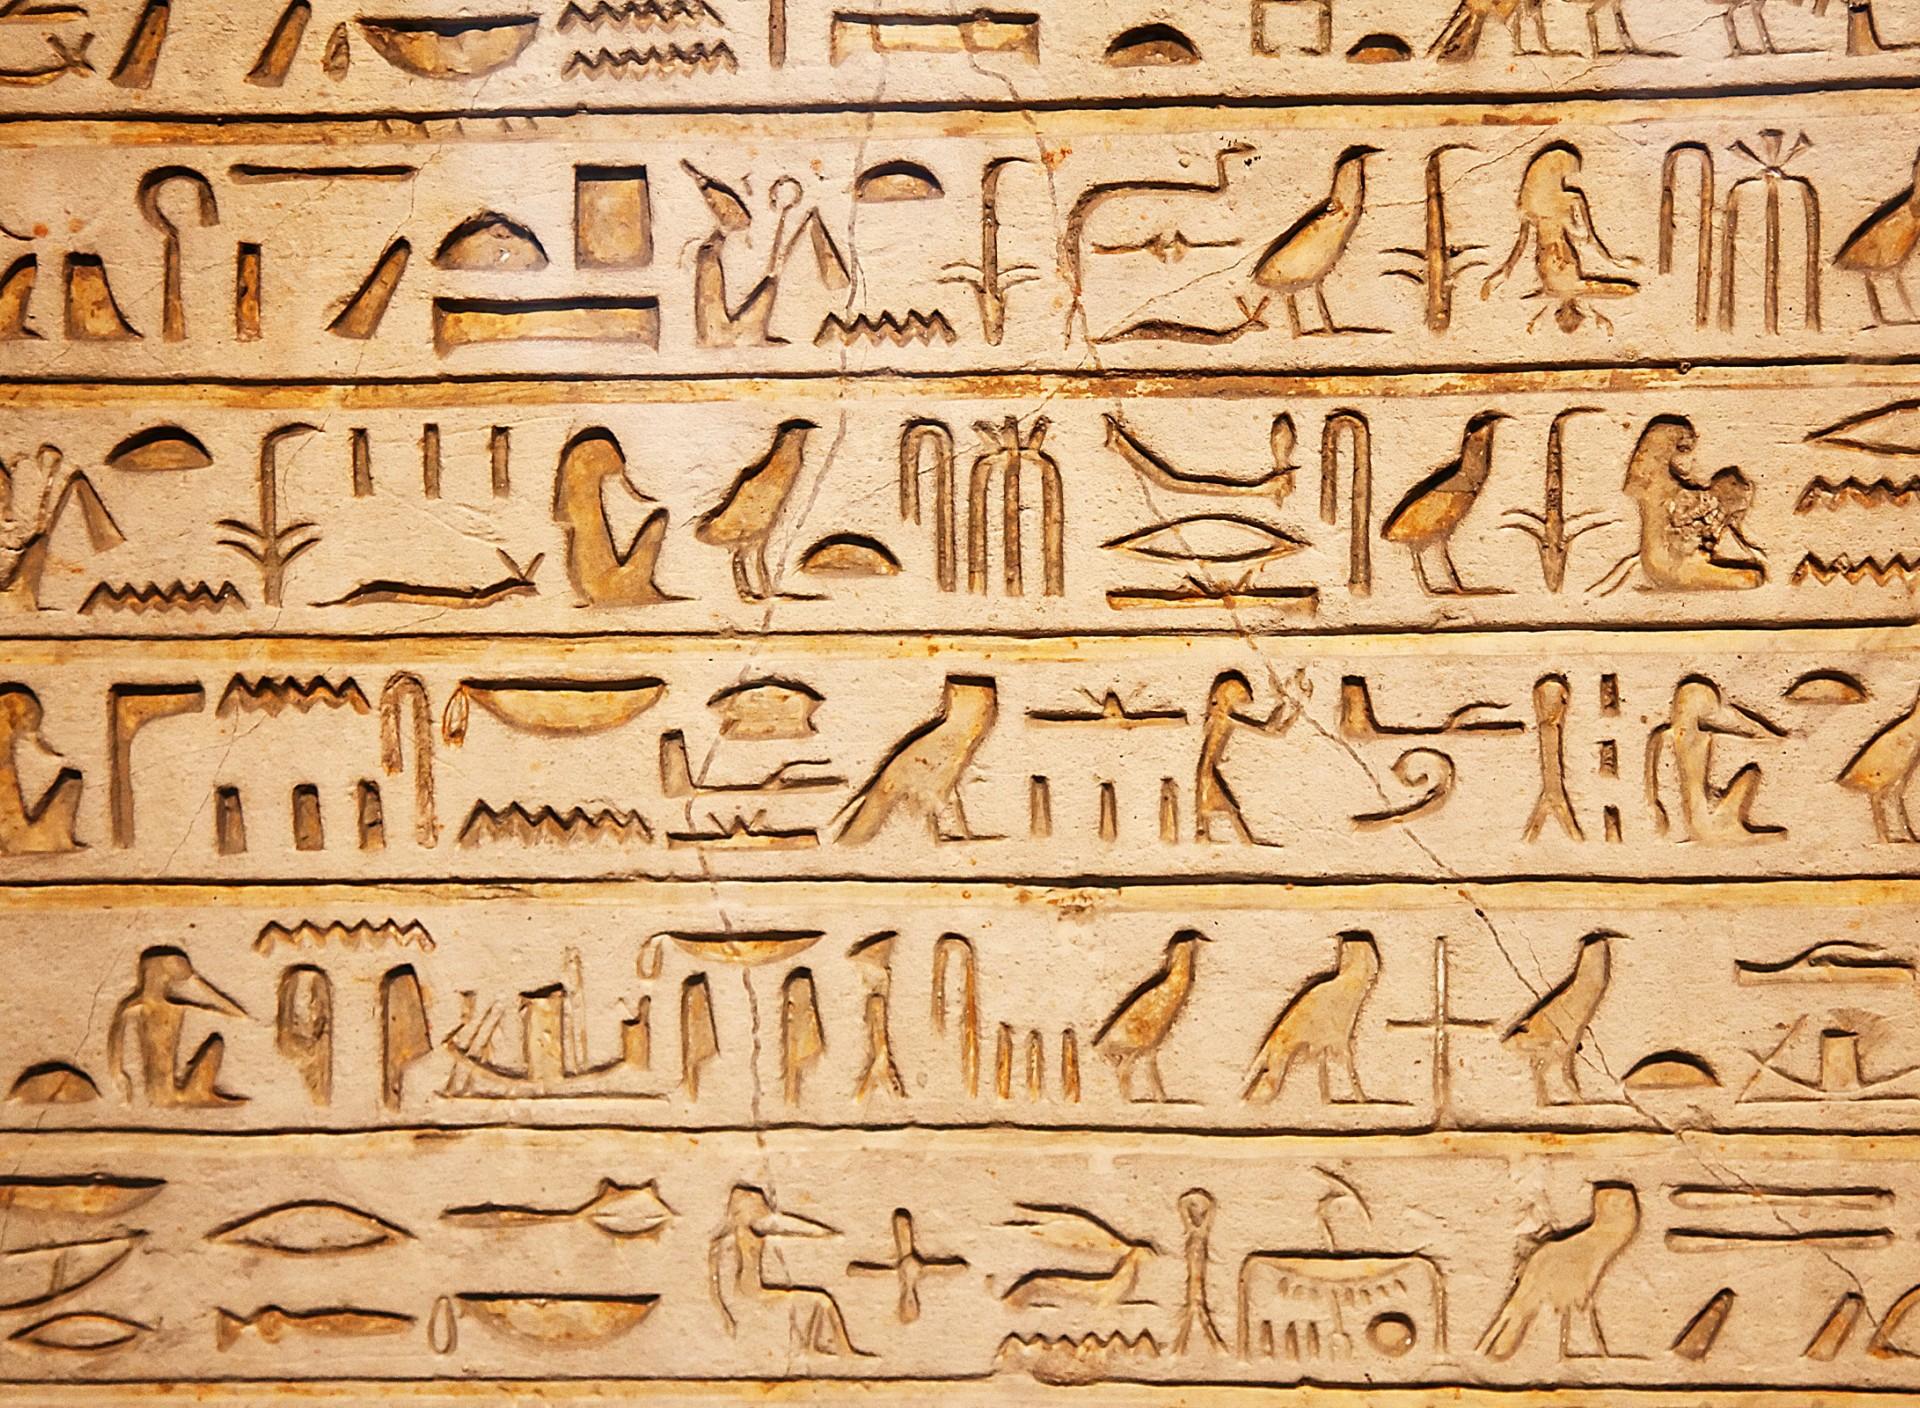 Free Fall Flowers Wallpaper Download Free Egyptian Hieroglyphics Wallpapers